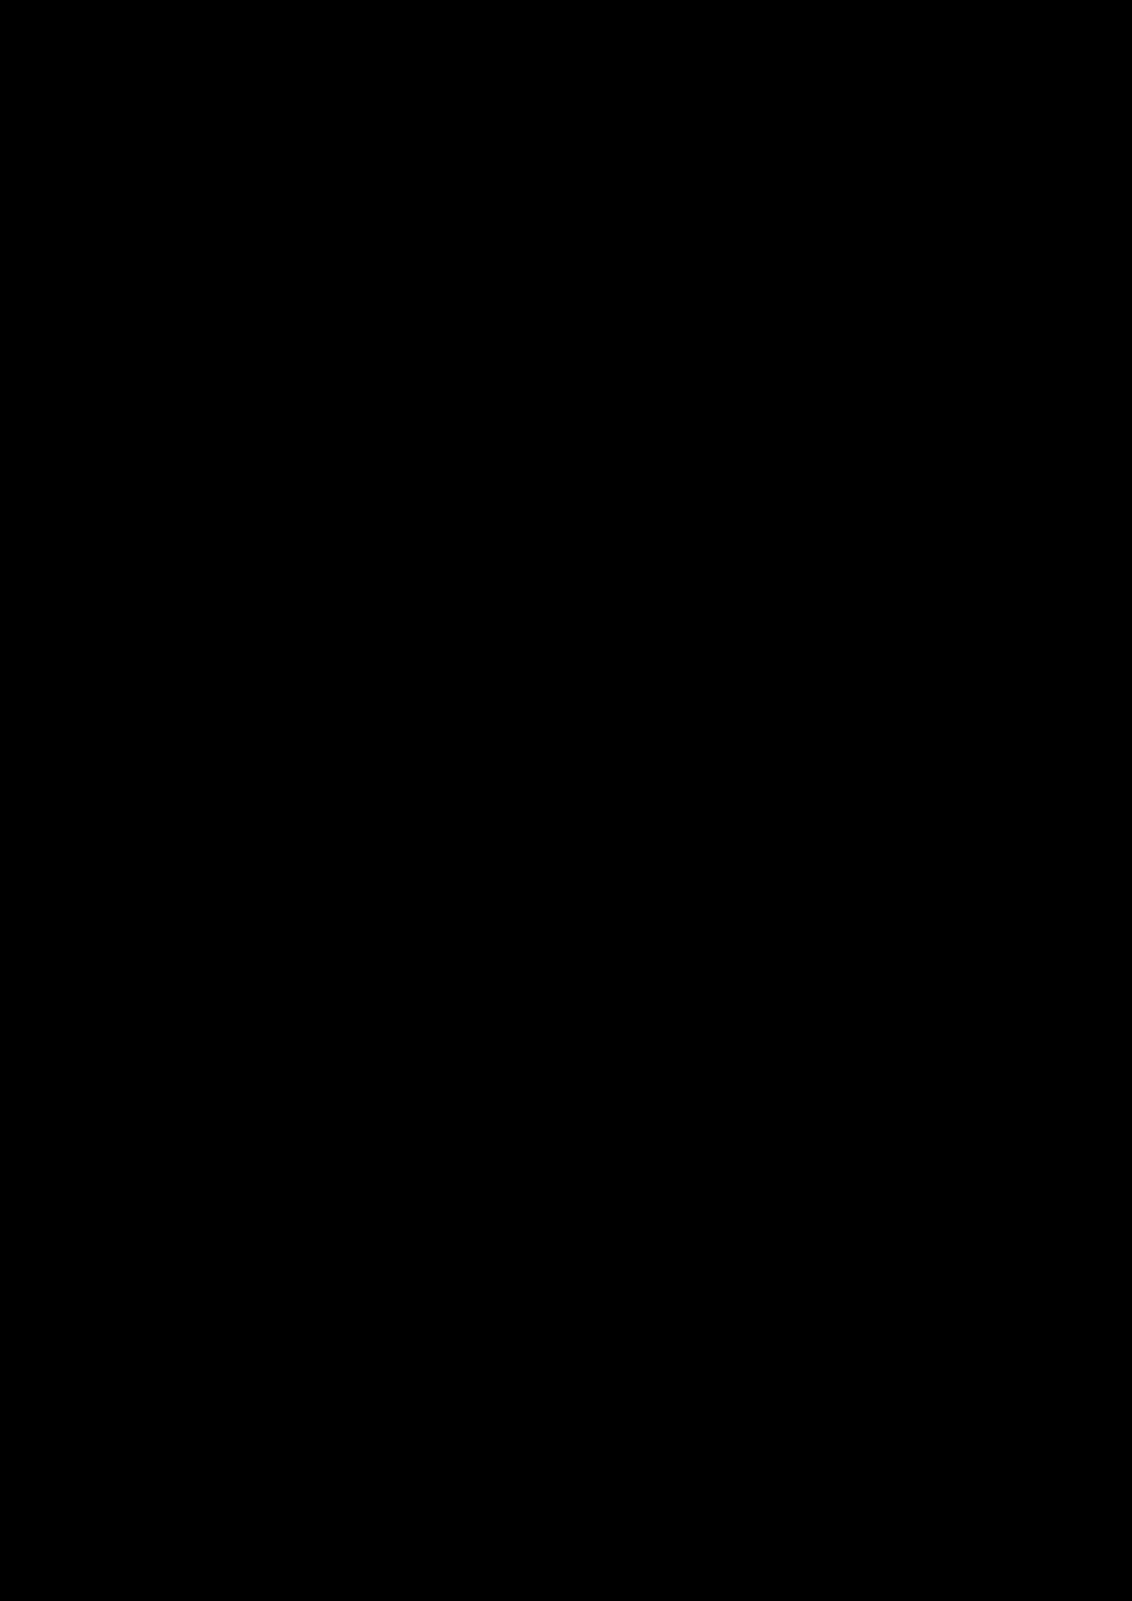 Ten lyubvi slide, Image 45